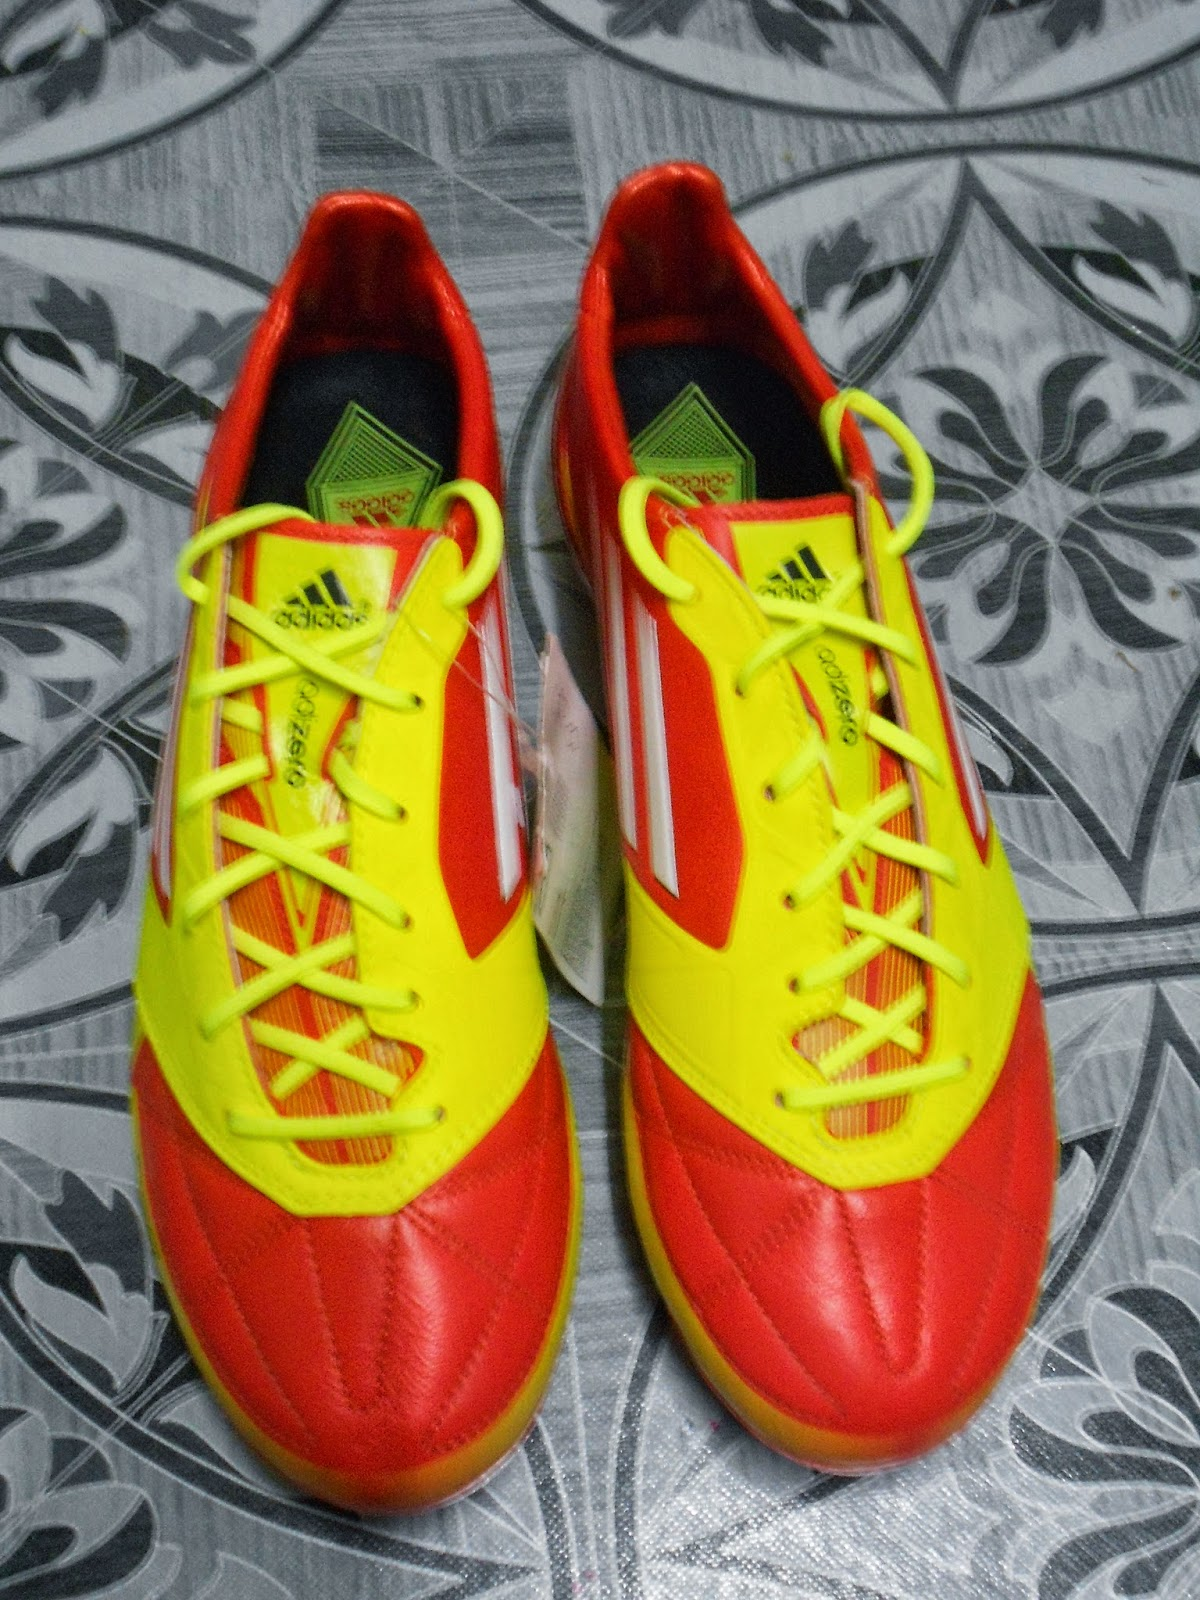 http://kasutbolacun.blogspot.com/2015/02/adidas-f50-adizero-micoach-1-fg-merah.html